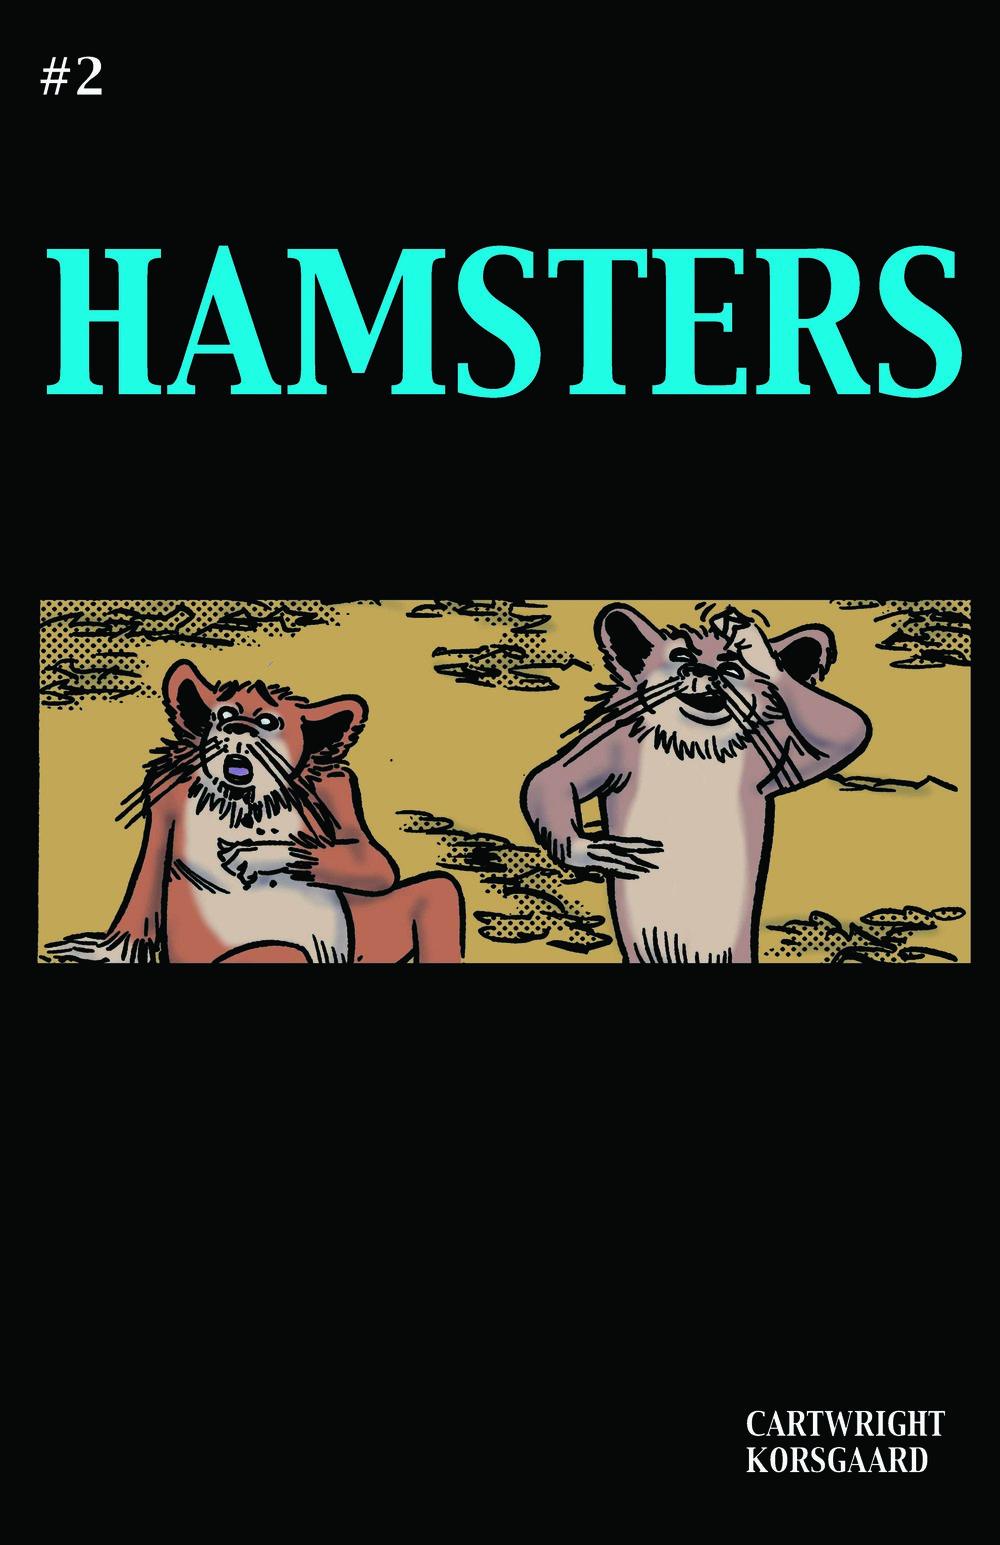 HamstersIssue2